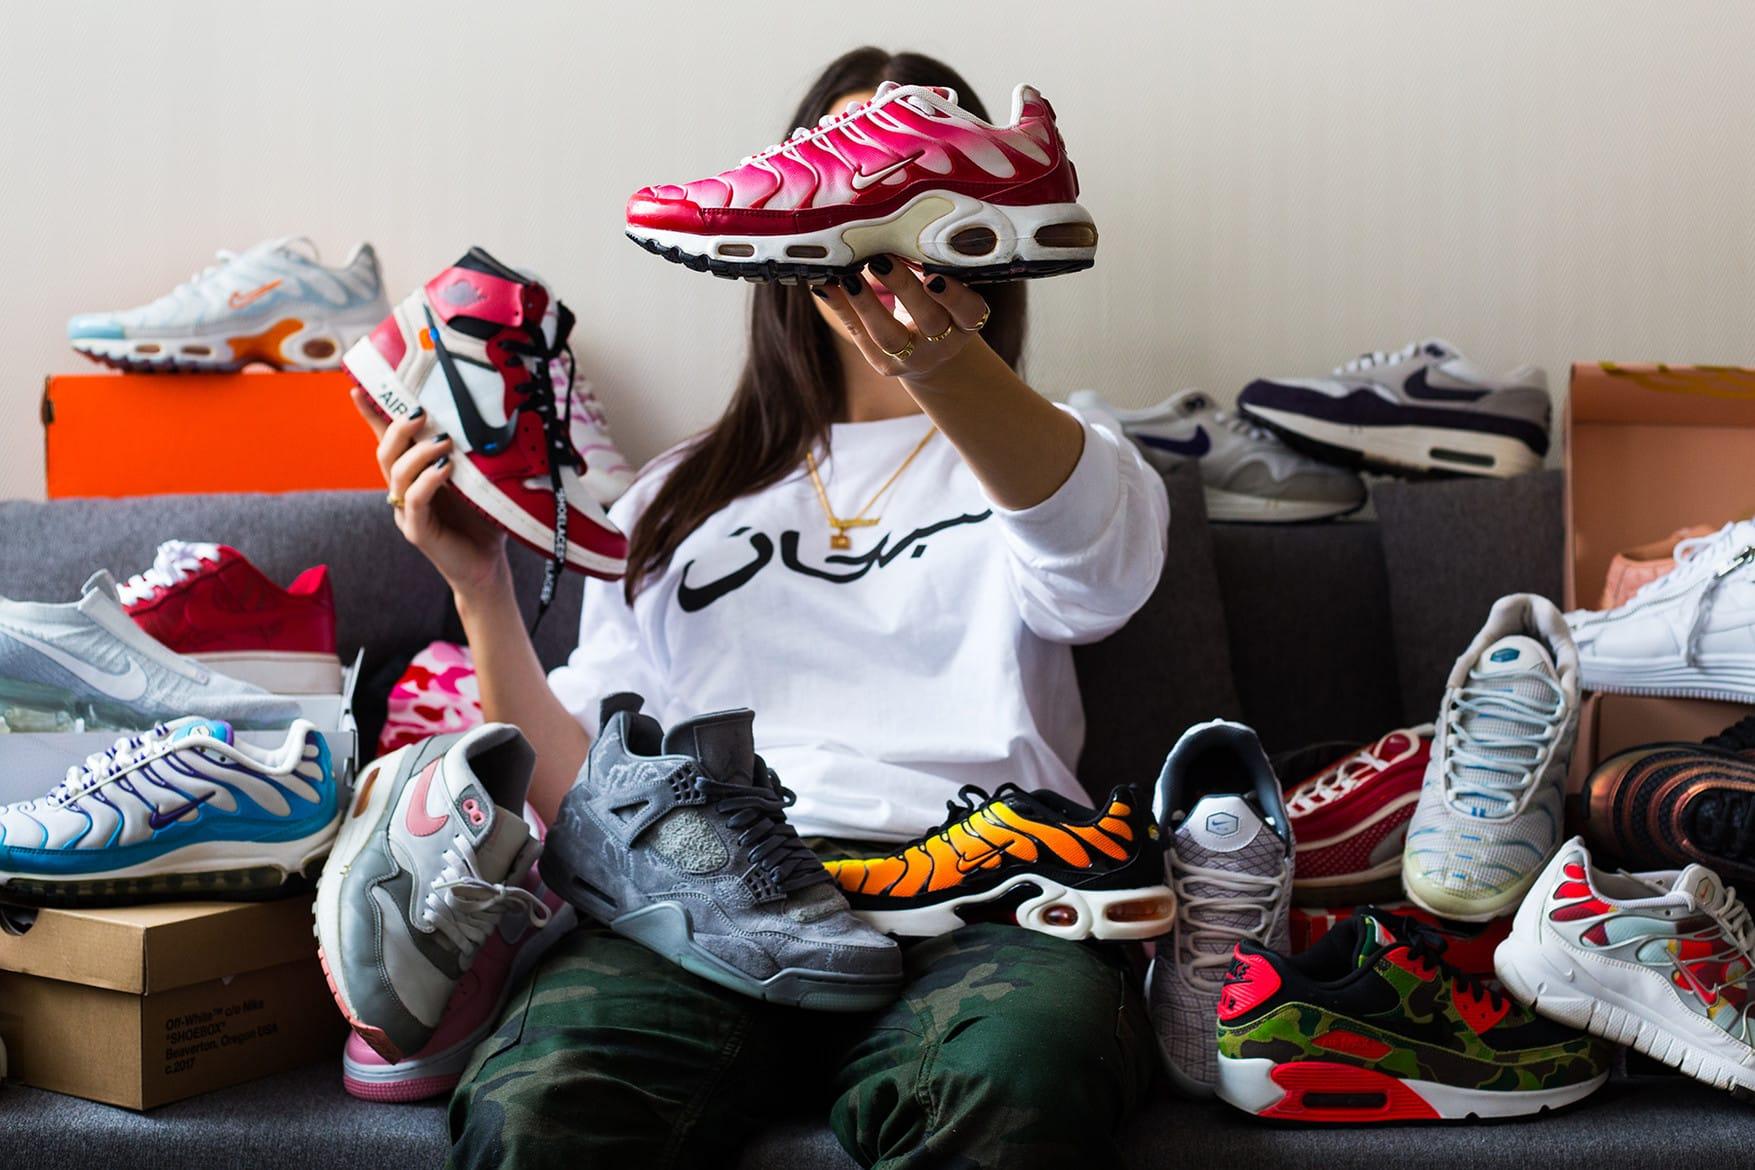 Women Sneaker Collections on Instagram